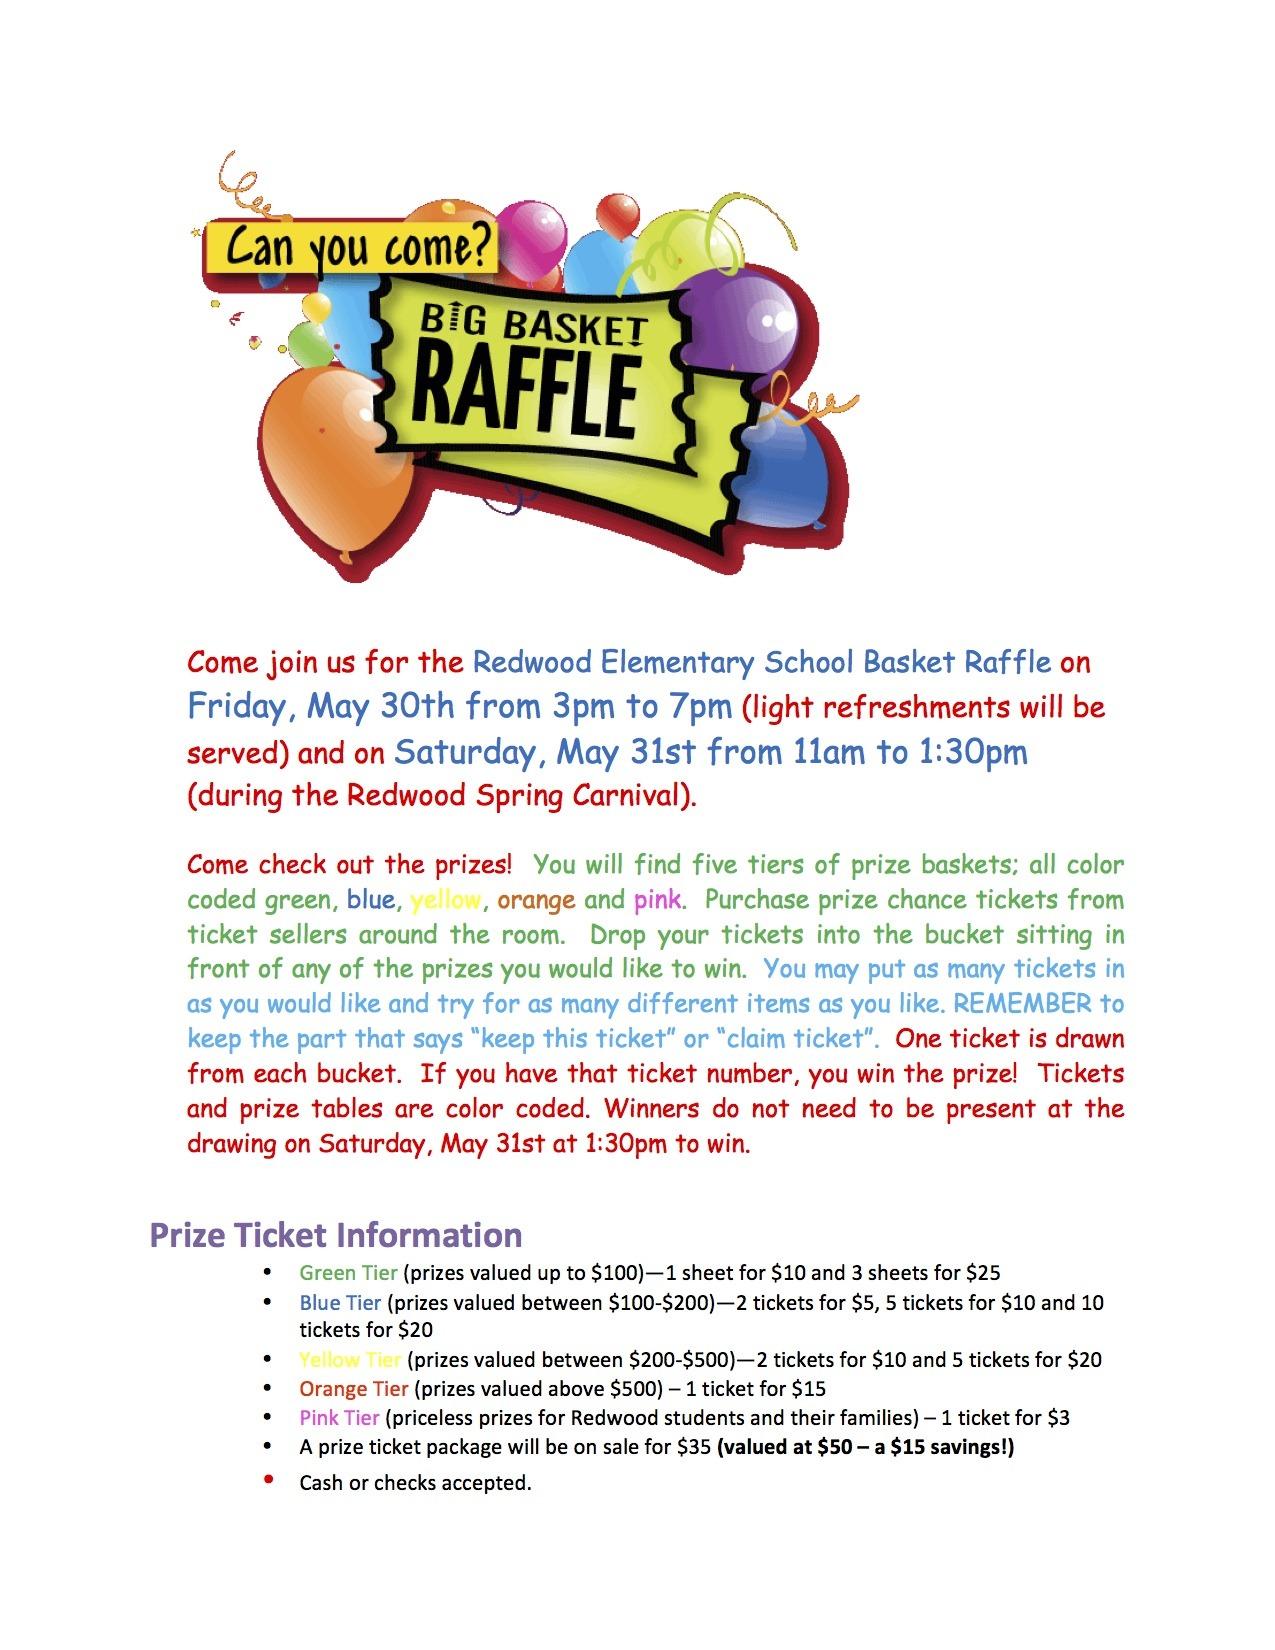 8fc9a4c119105d2e8d79_basket-raffle-prize-ticket-information-2014-4-2.jpg